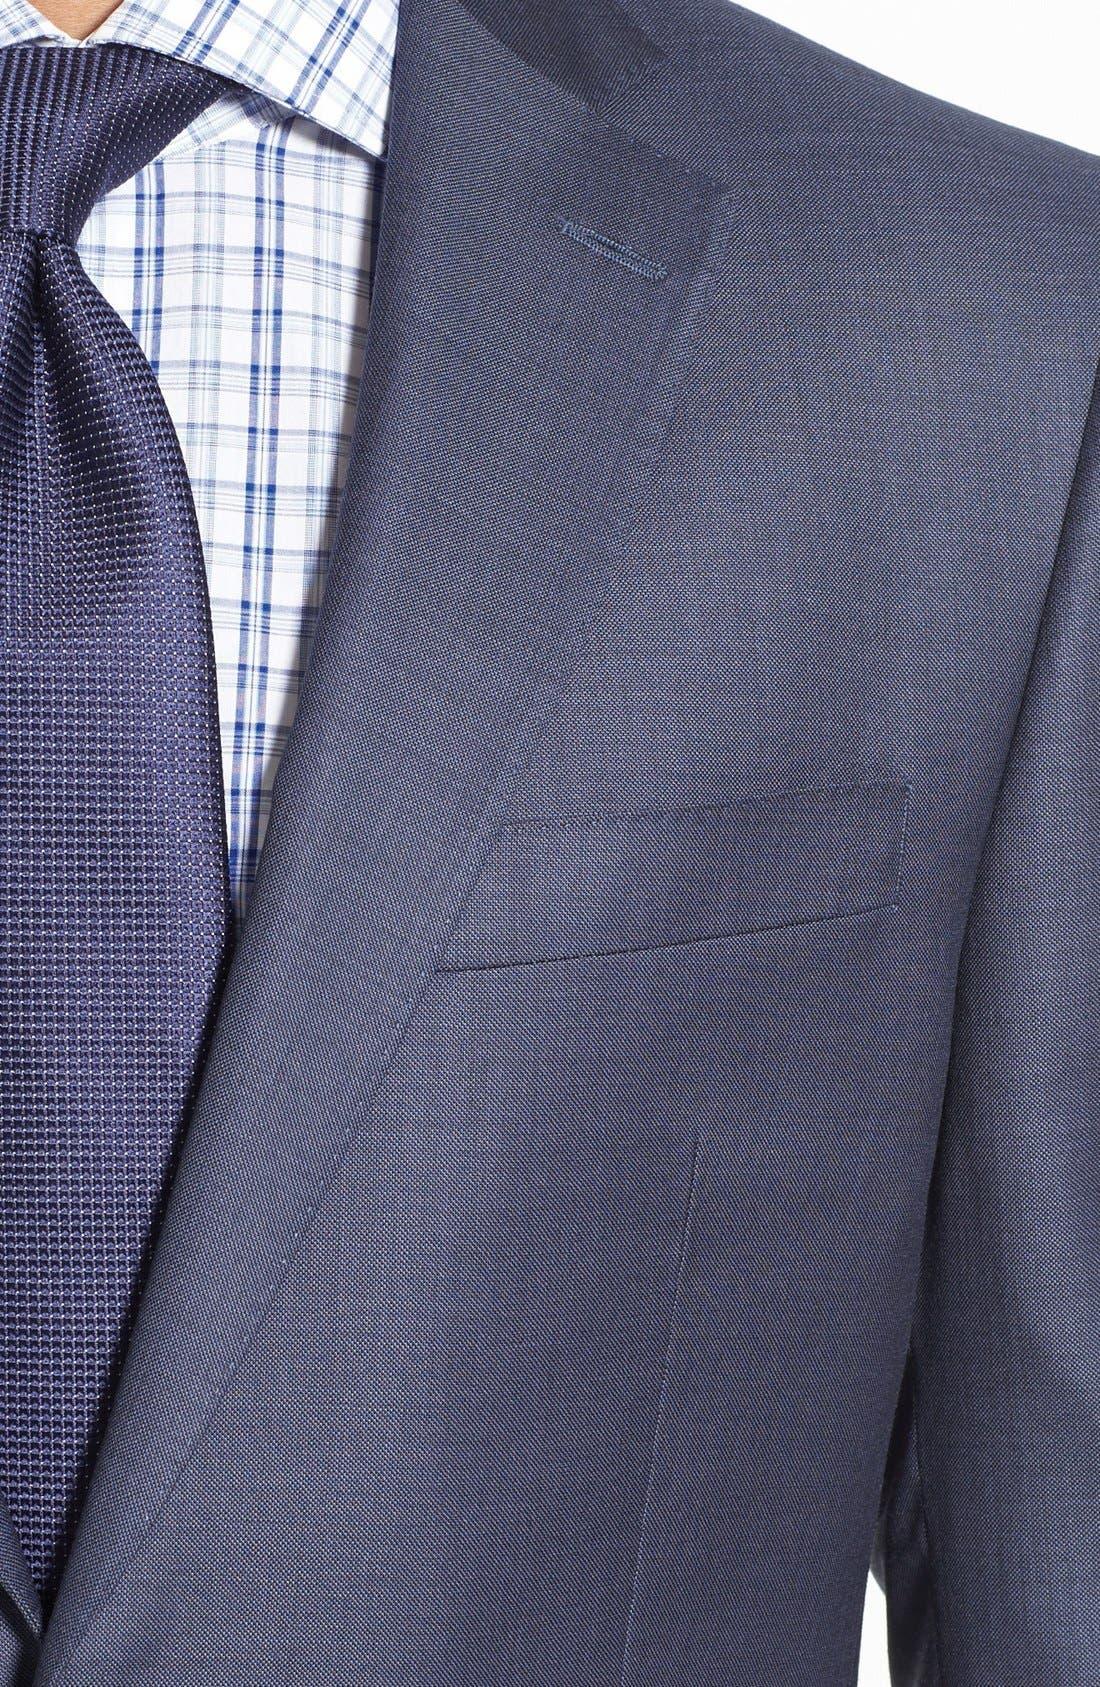 Alternate Image 4  - Peter Millar Classic Fit Wool Suit